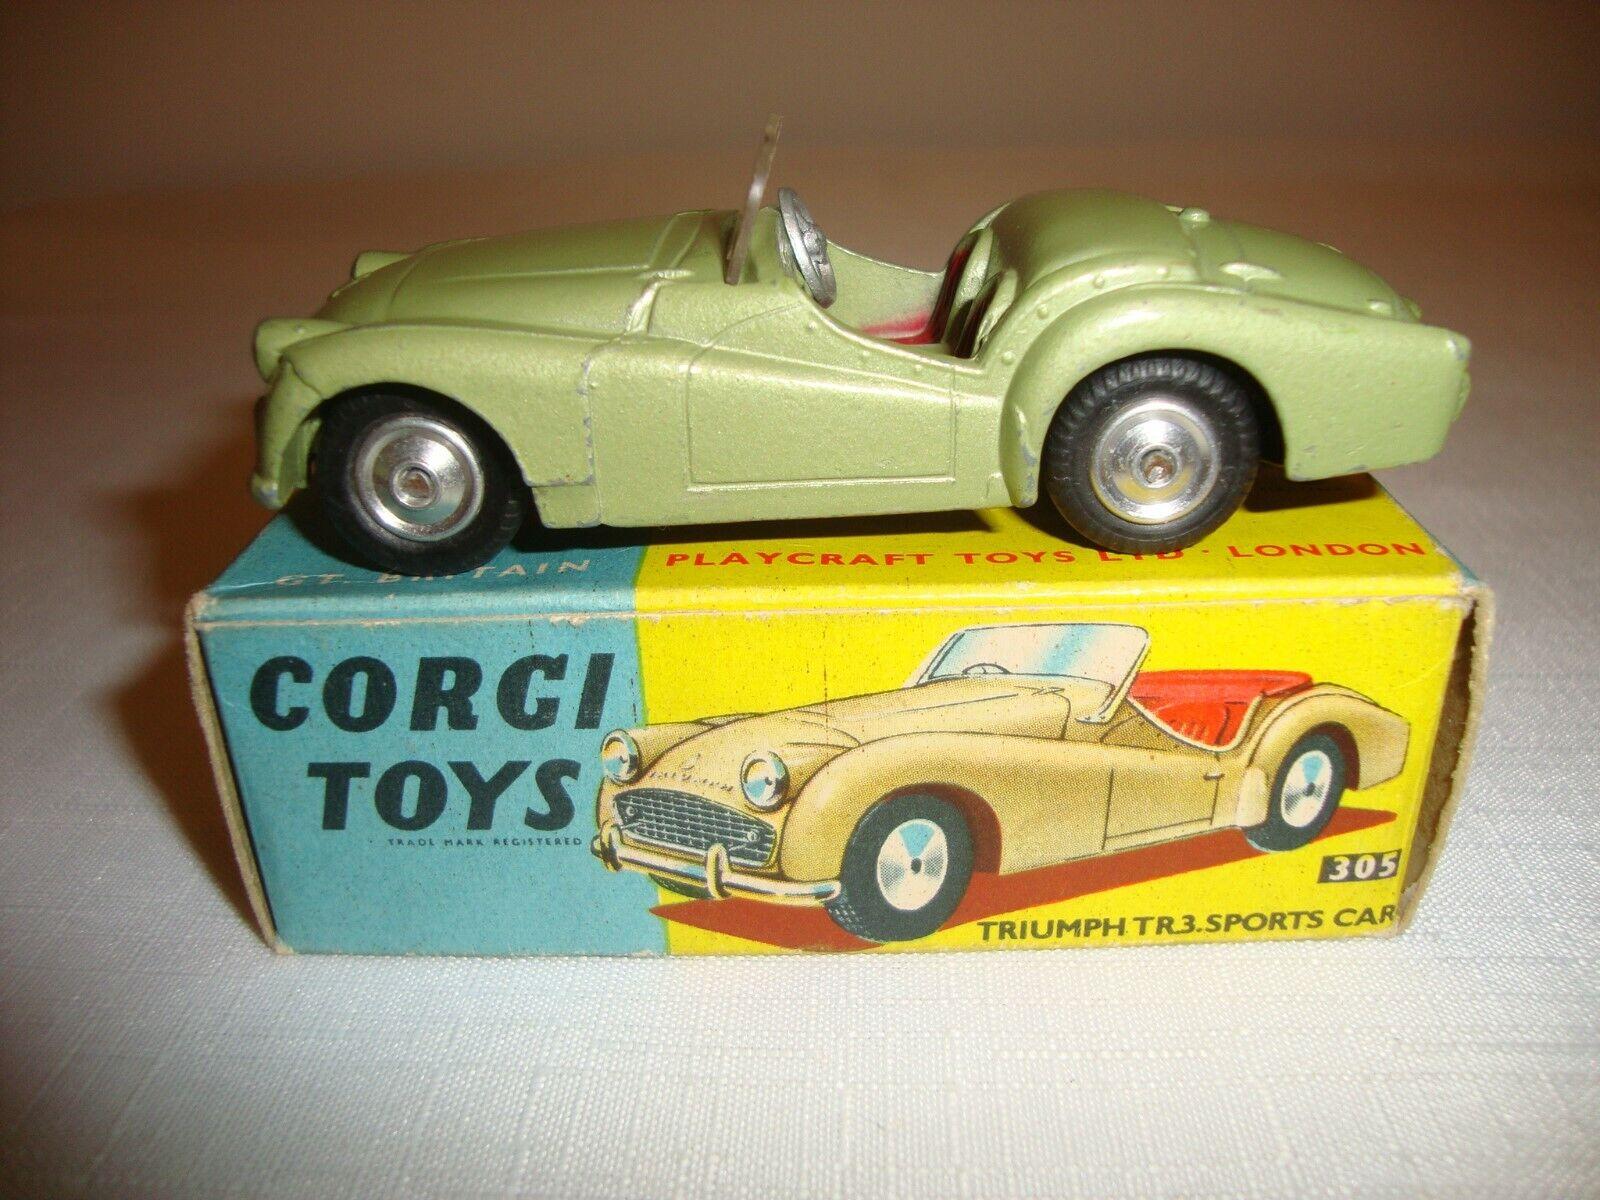 CORGI CORGI CORGI 305 TRIUMPH TR3 SPORTS CAR (SHAPED HUBS) - EXCELLENT in original BOX 712